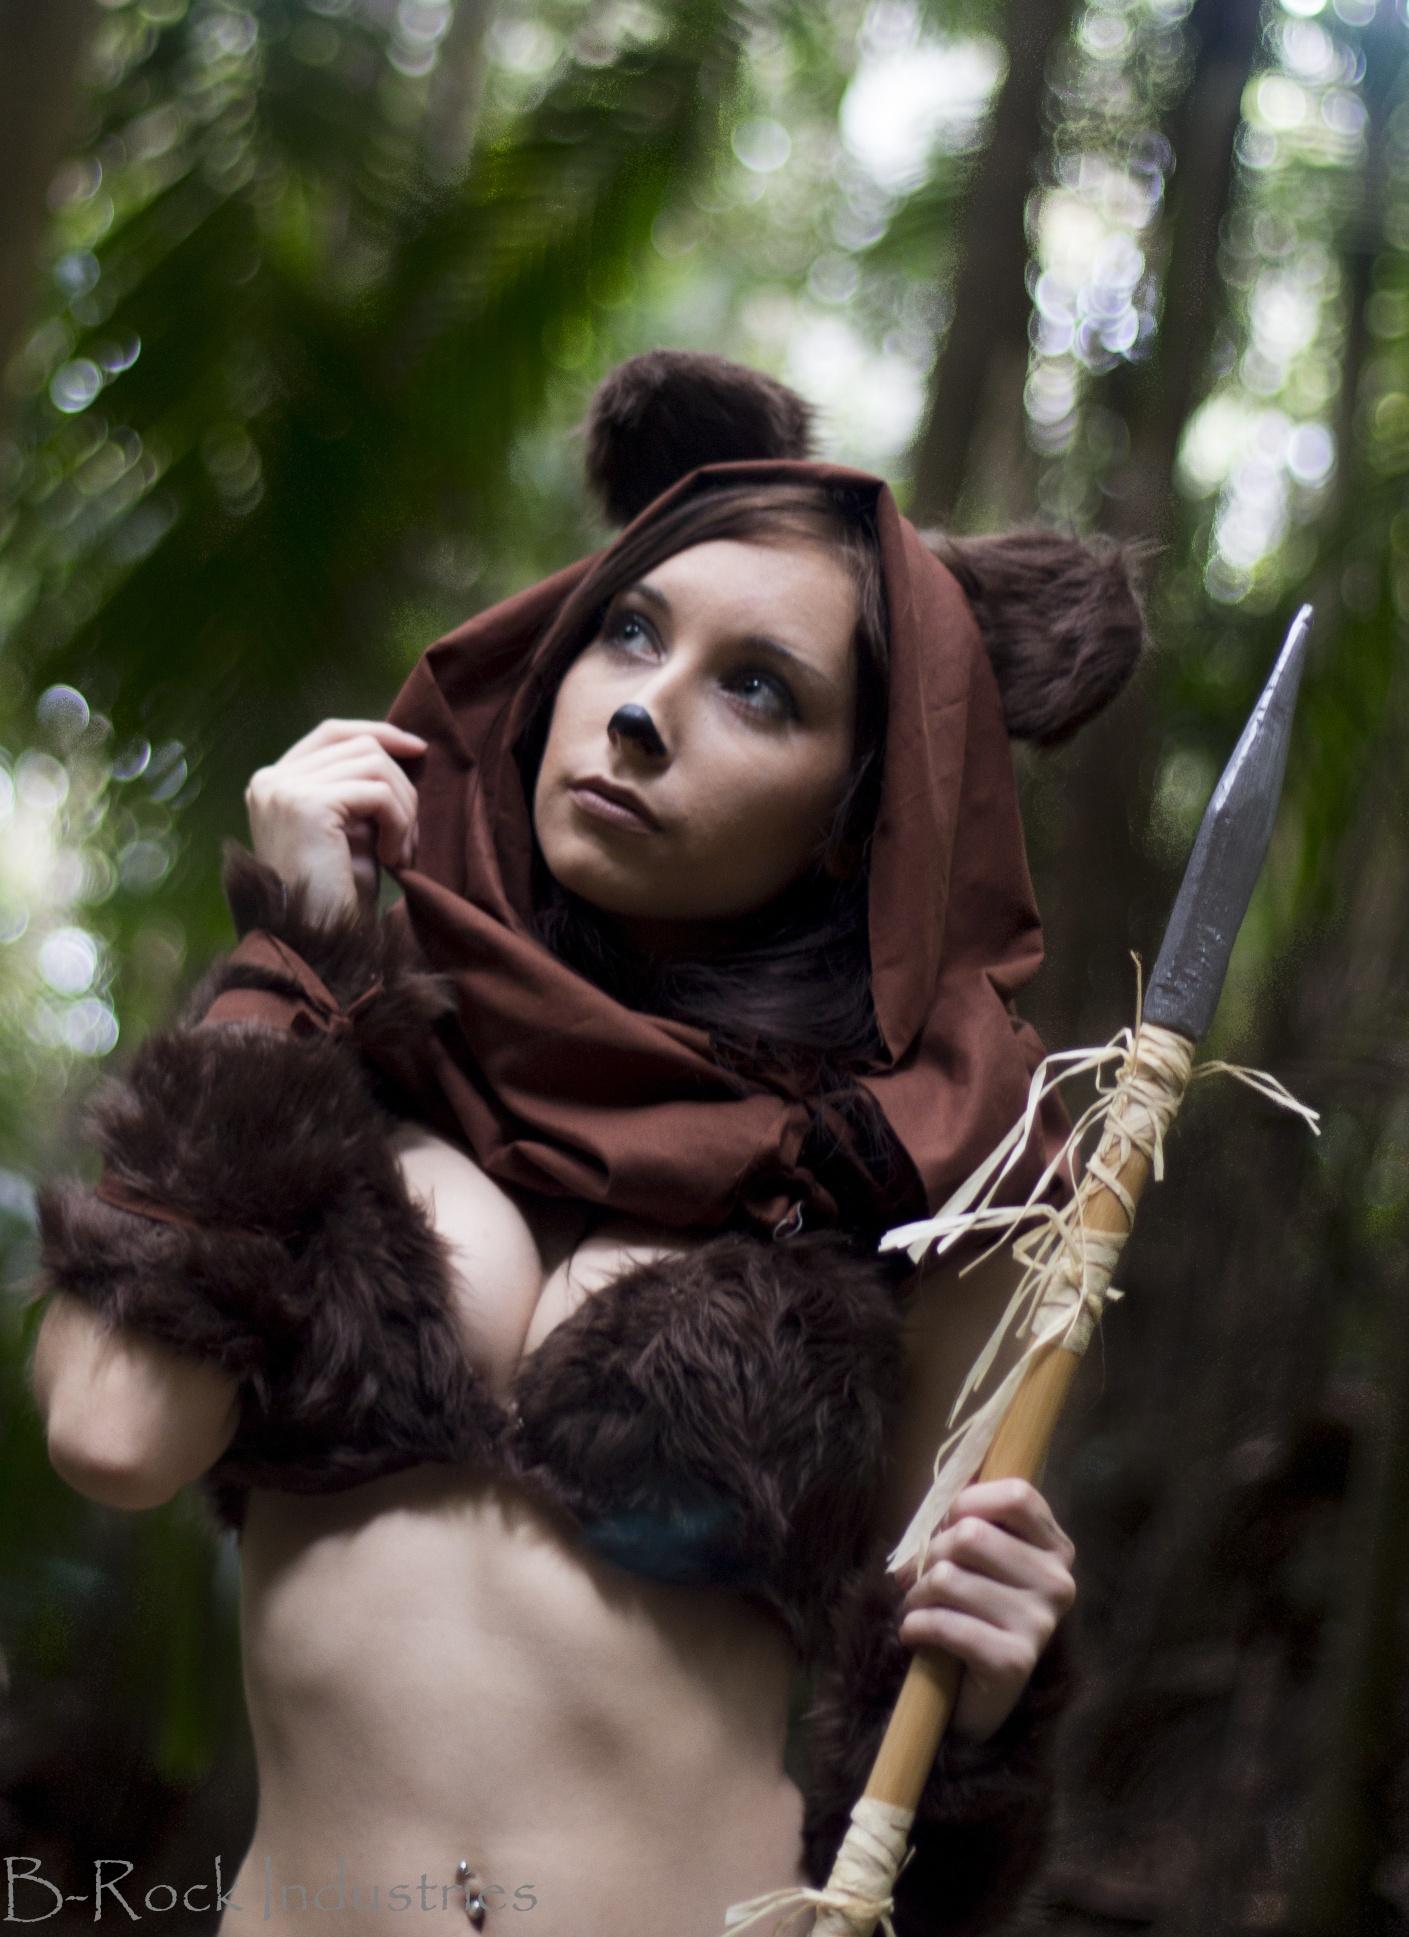 star wars ewok cosplay by hurutotheguru on deviantart